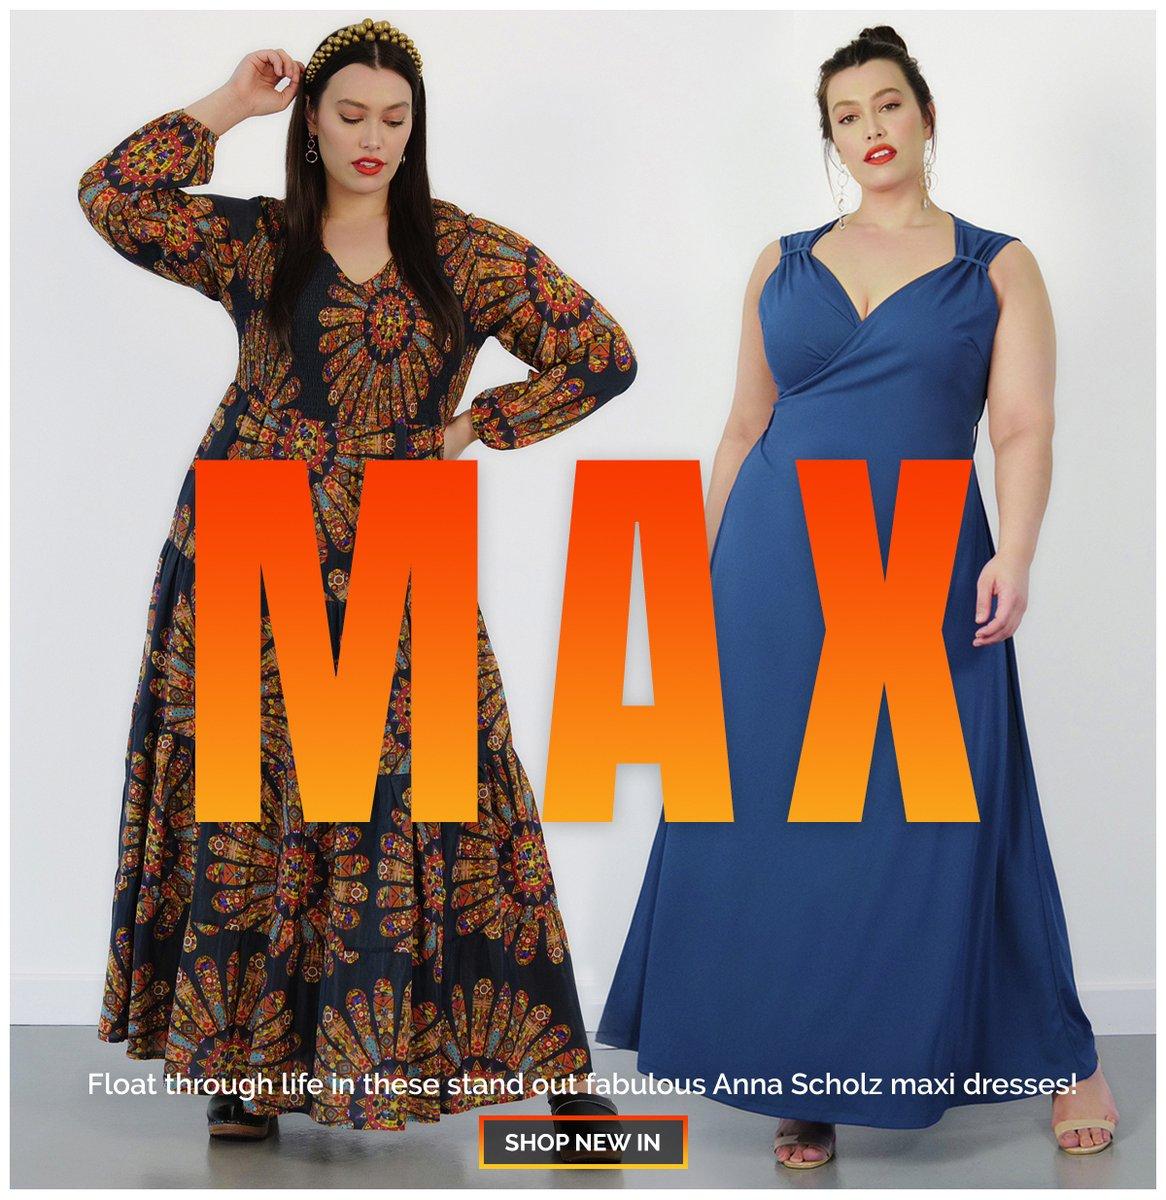 test Twitter Media - Maxi dresses for every occasion :) #annascholz #plussize https://t.co/0qGVOMM5bZ https://t.co/33LisbUvr1